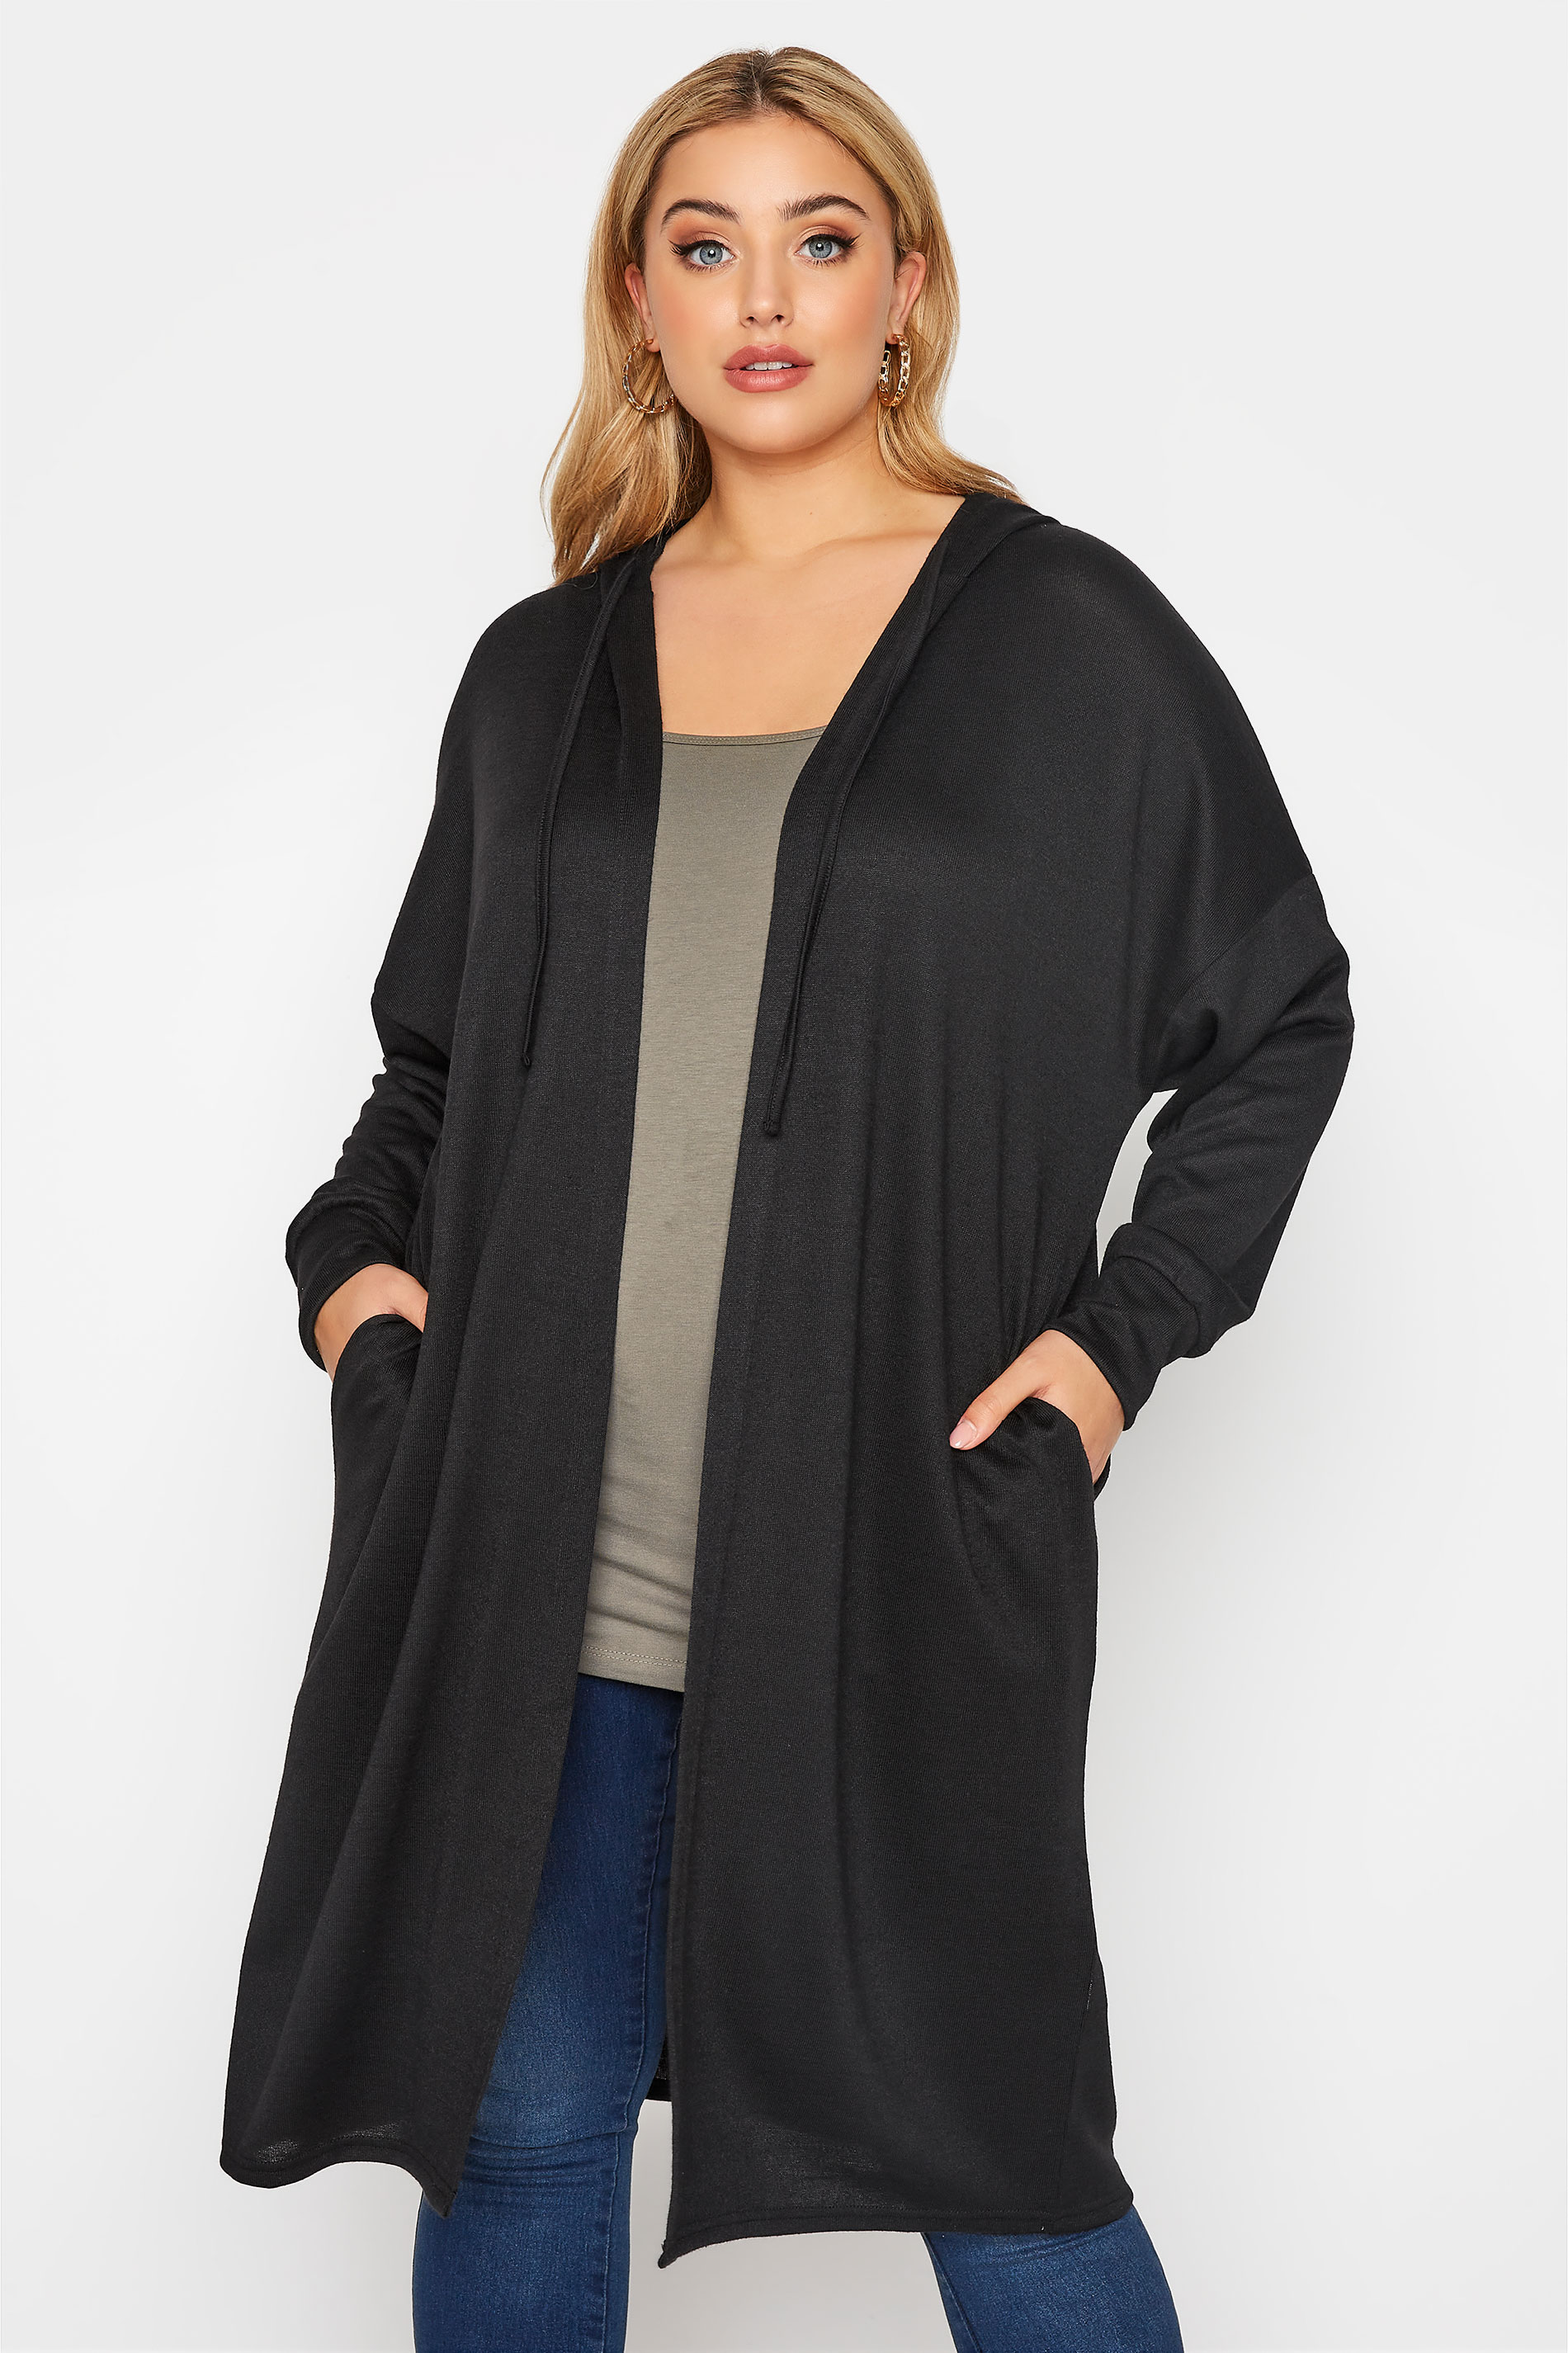 Black Hooded Knitted Cardigan_A.jpg